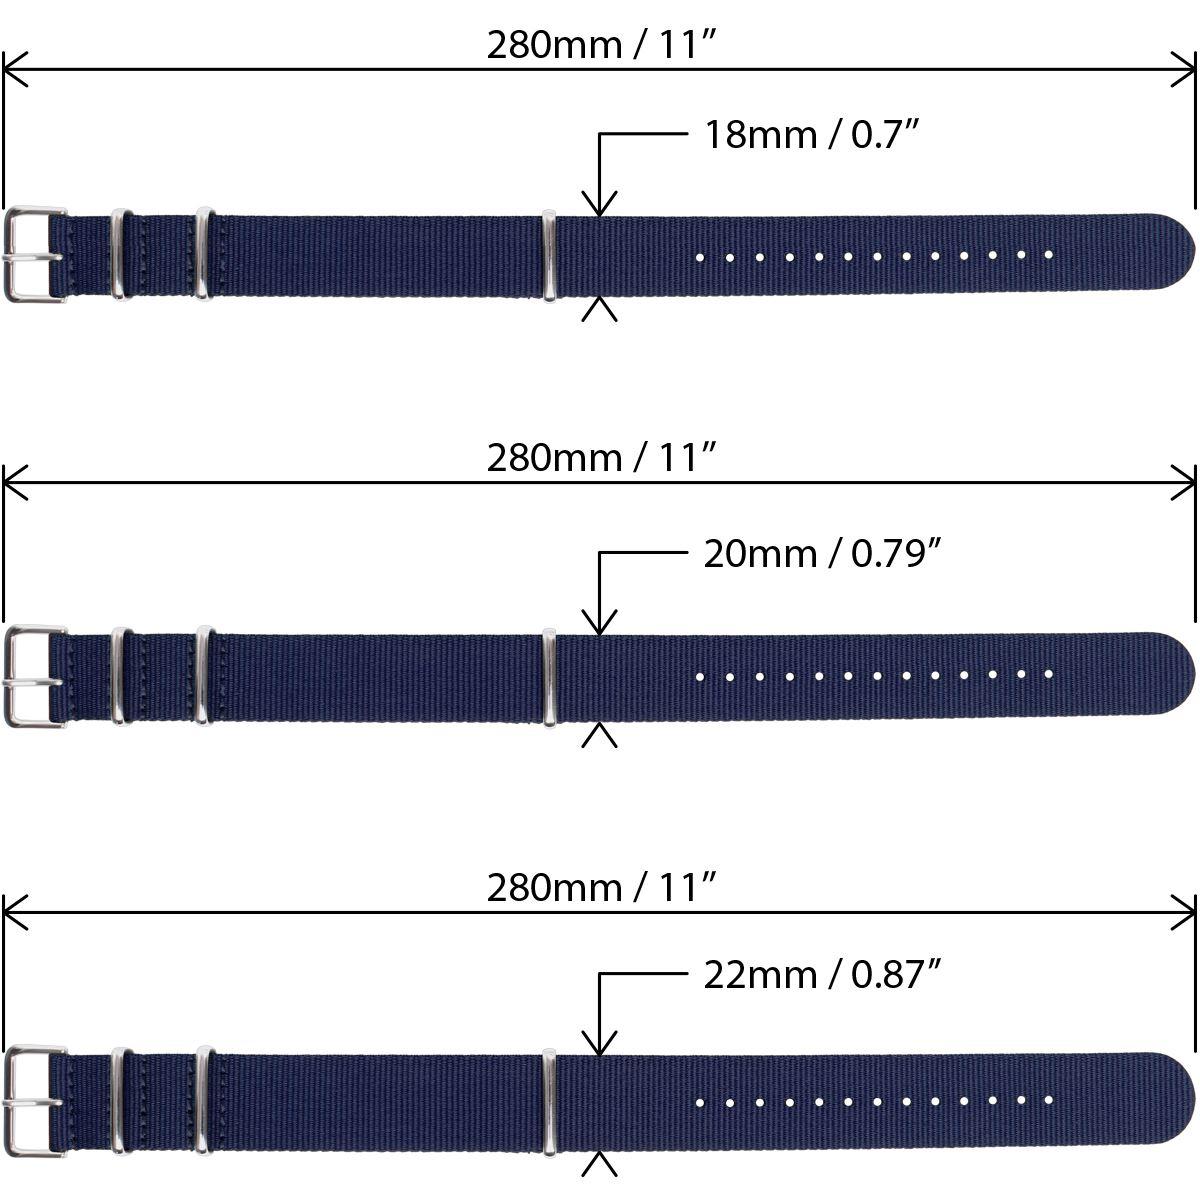 Nato-Watch-Strap-Nylon-Men-Wrist-18mm-20mm-22mm-Smart-Military-Zulu-Pin-Straps